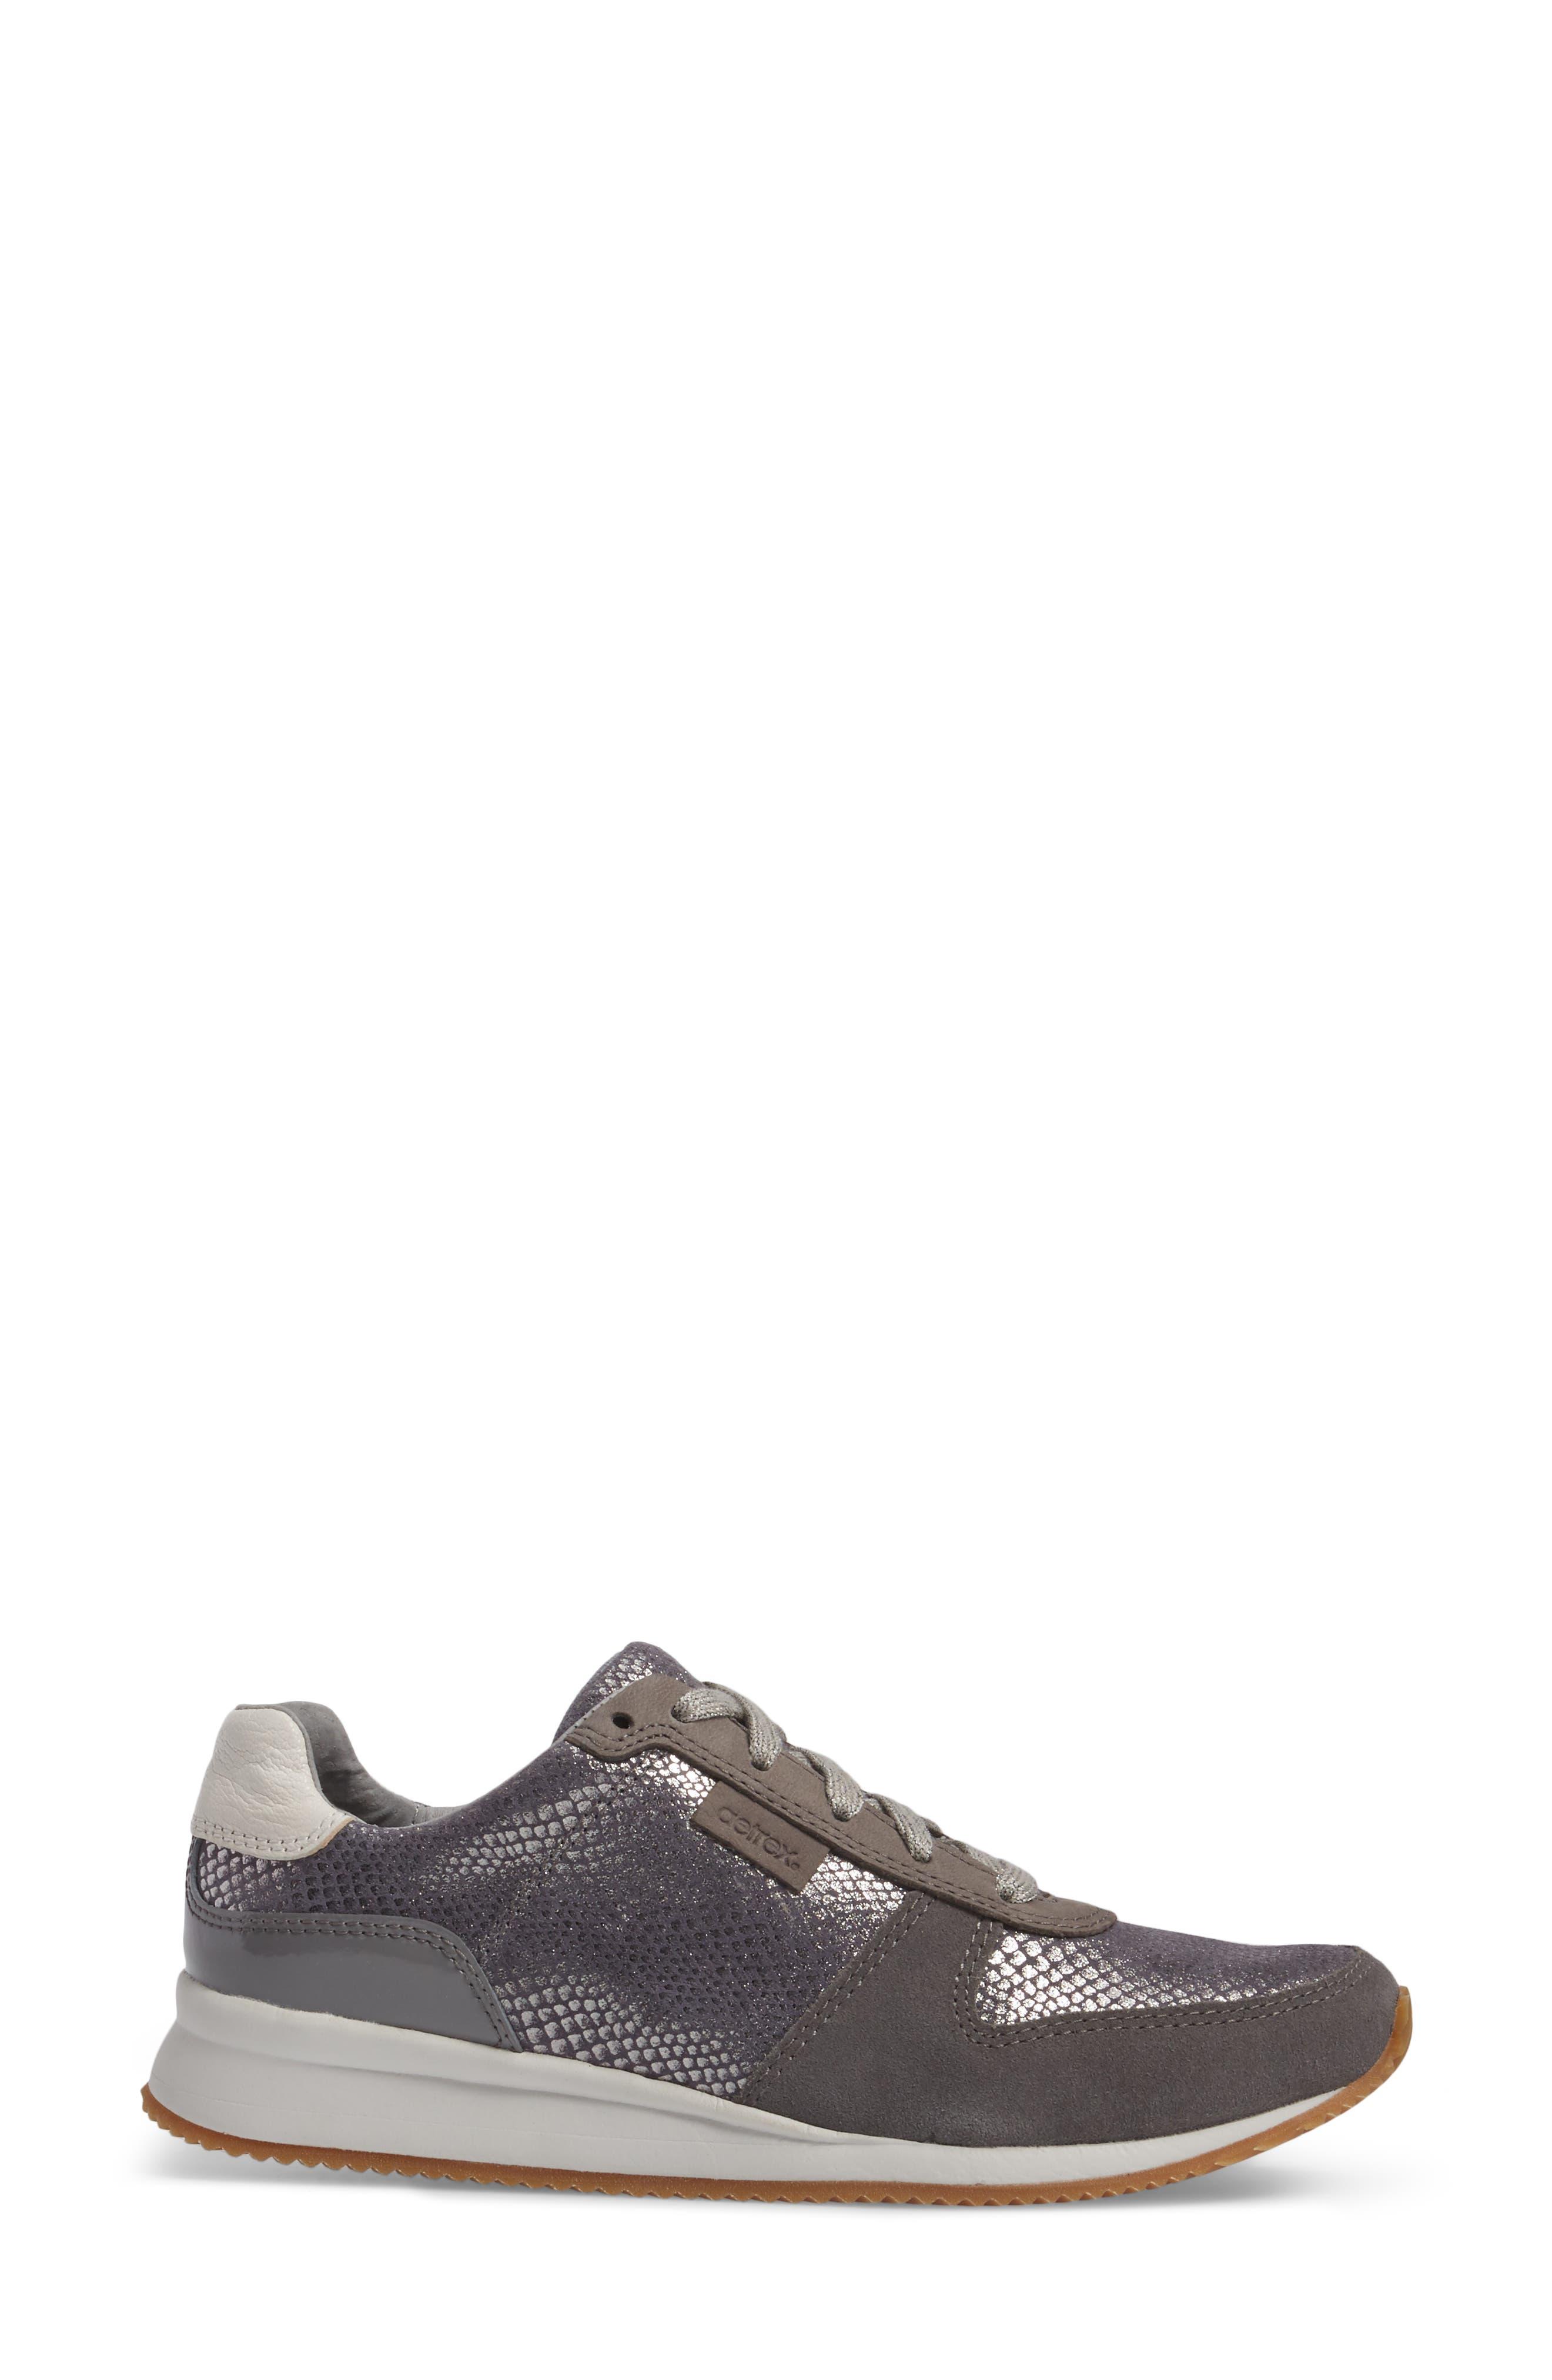 Daphne Sneaker,                             Alternate thumbnail 3, color,                             Grey Leather